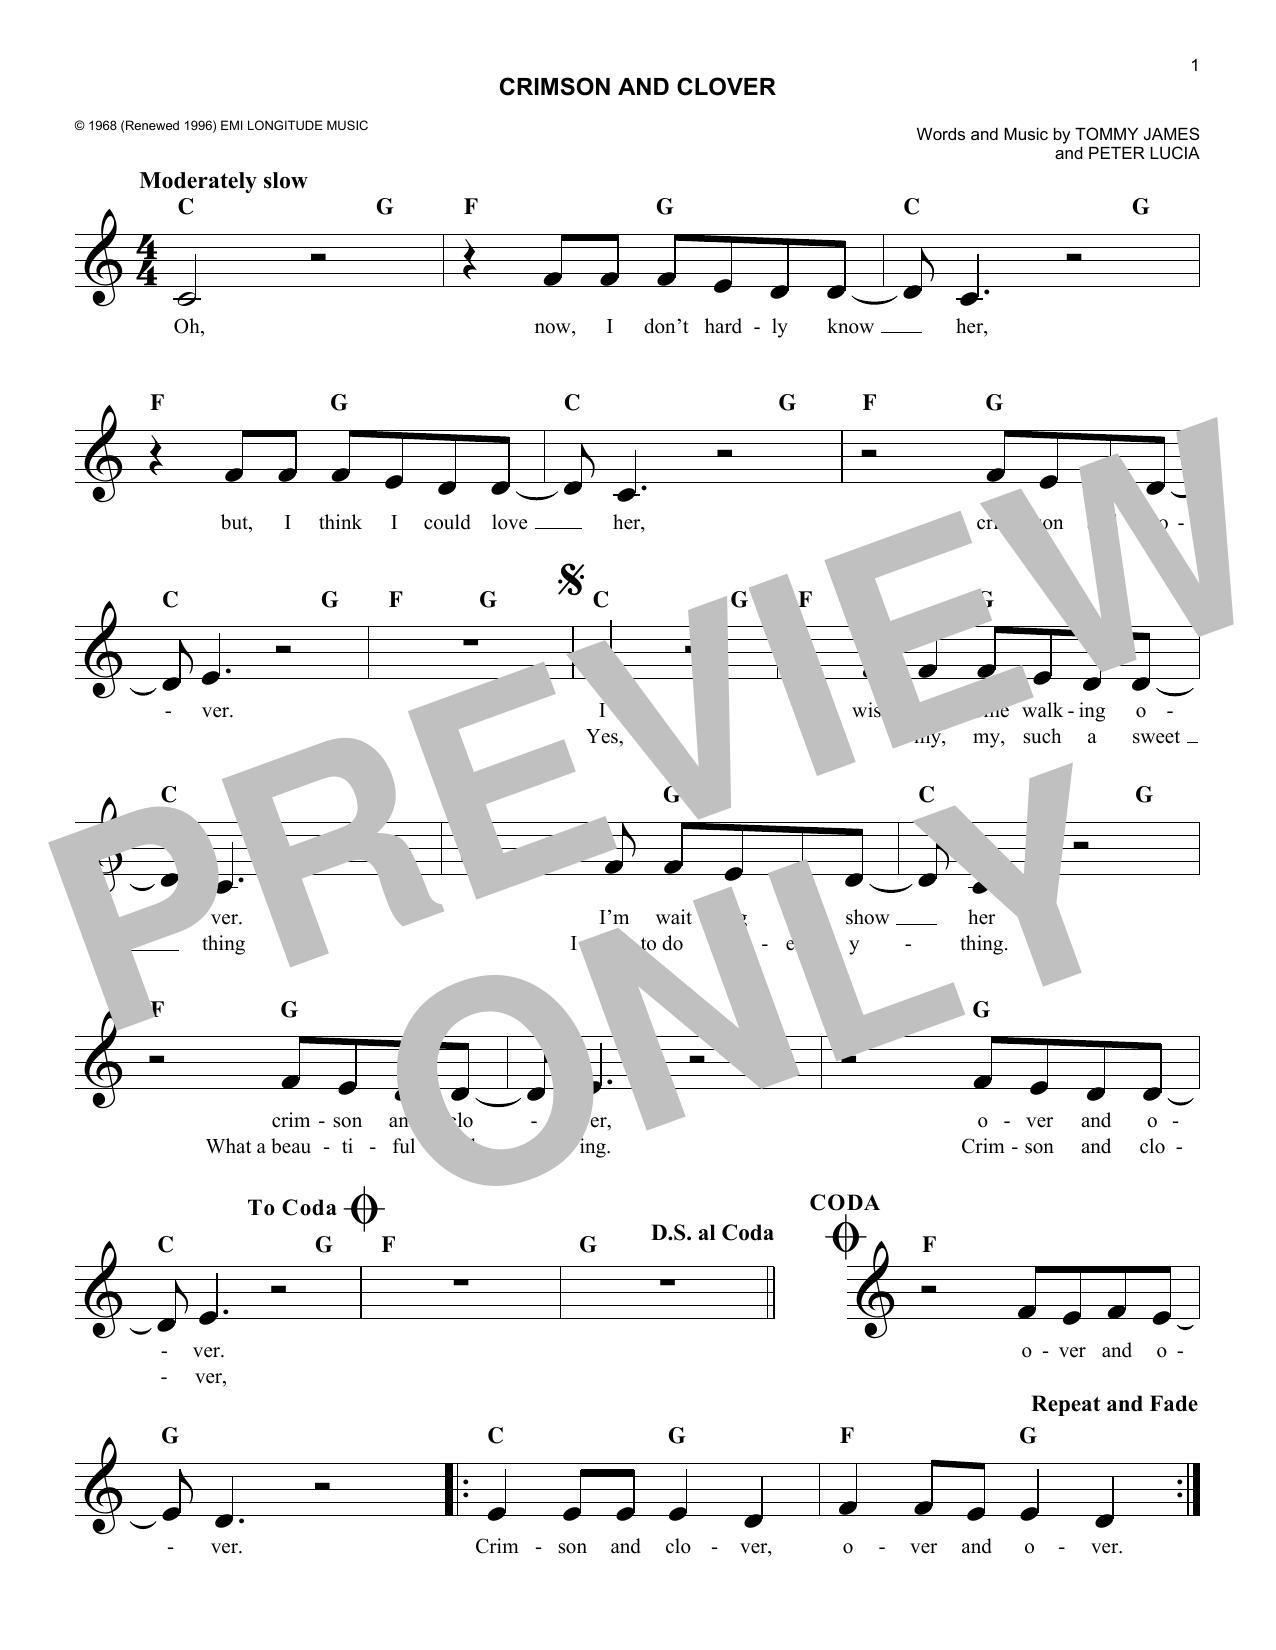 Sheet Music Digital Files To Print Licensed Joan Jett Digital